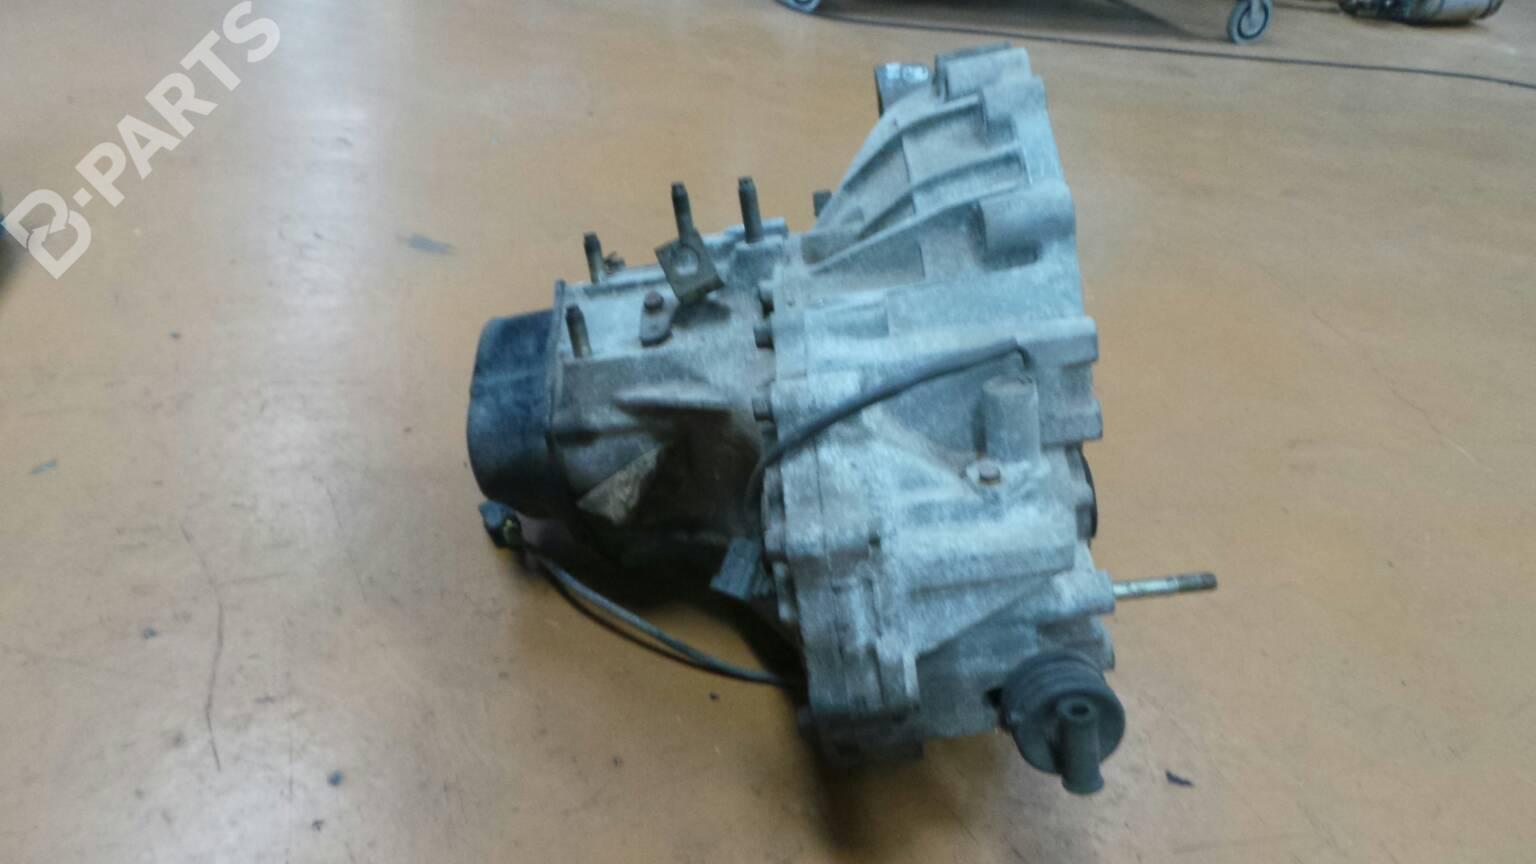 manual gearbox mazda mx 3 ec 1 8 i v6 28431 rh b parts com Ford Manual Transmission Guide 1992 mazda mx3 manual transmission